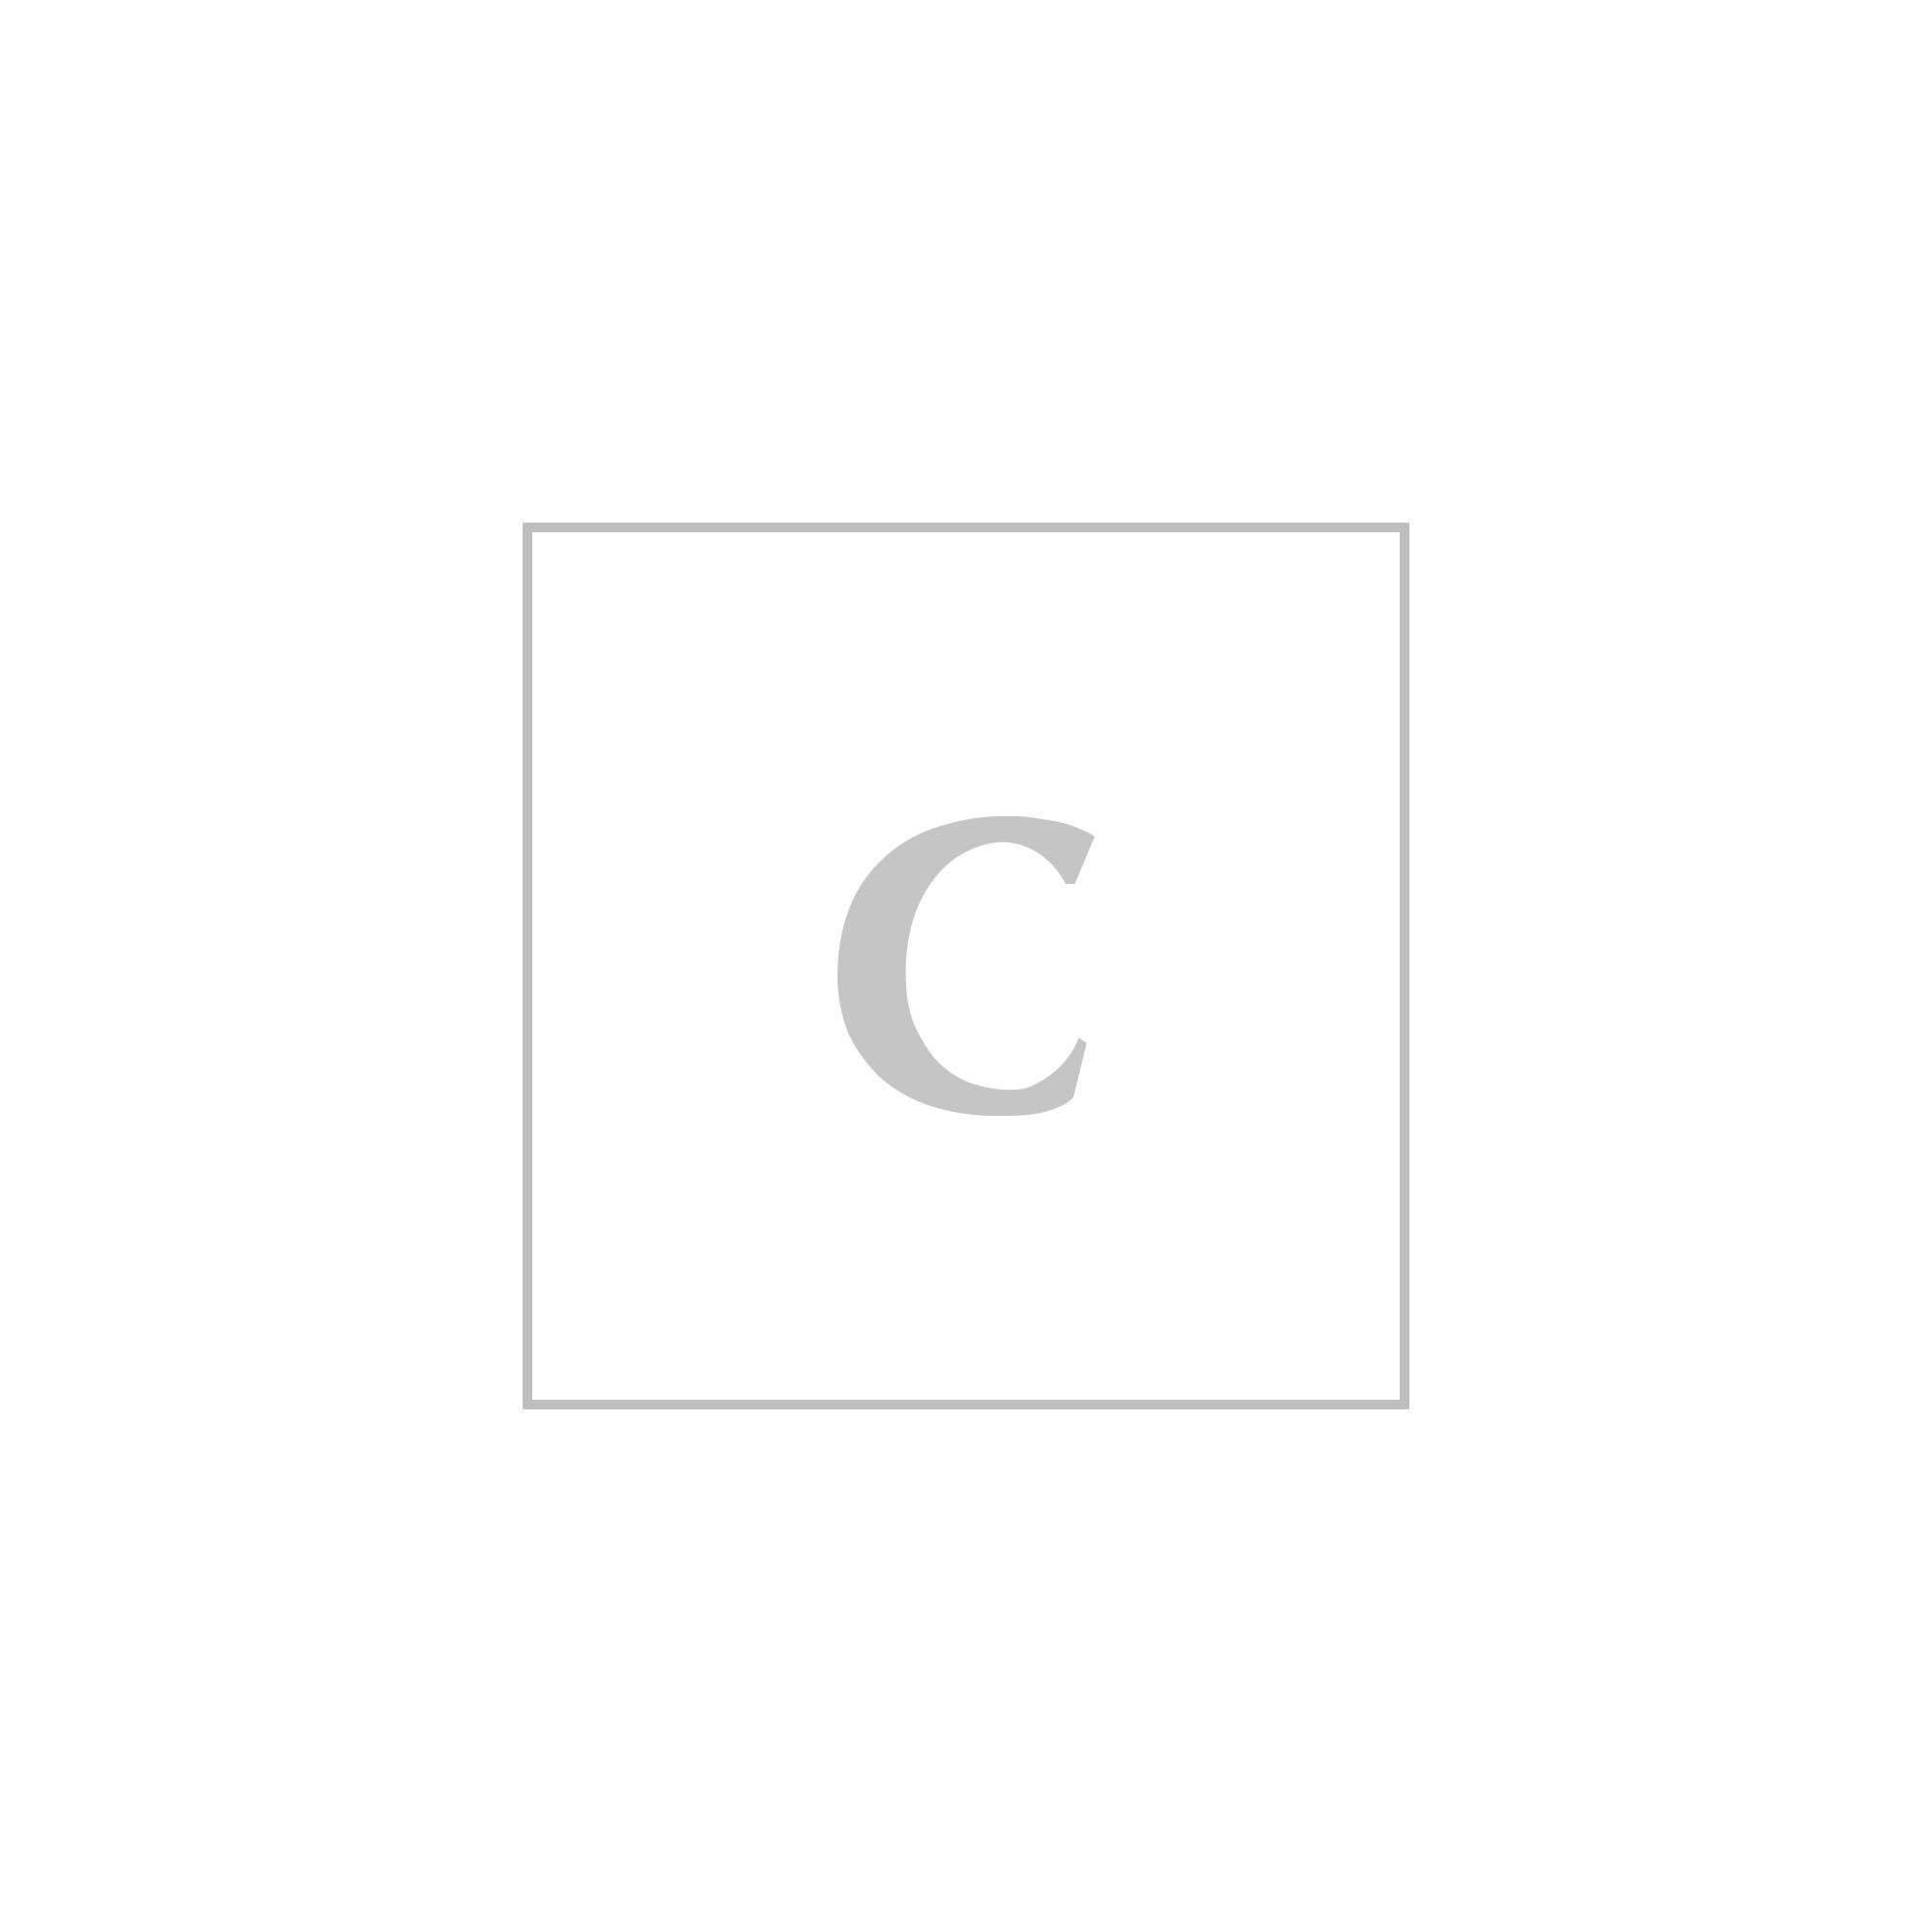 info for c4a3d 550b5 pantaloni calvin-klein-205w39nyc grigio 182920upn000003-034-3.jpg